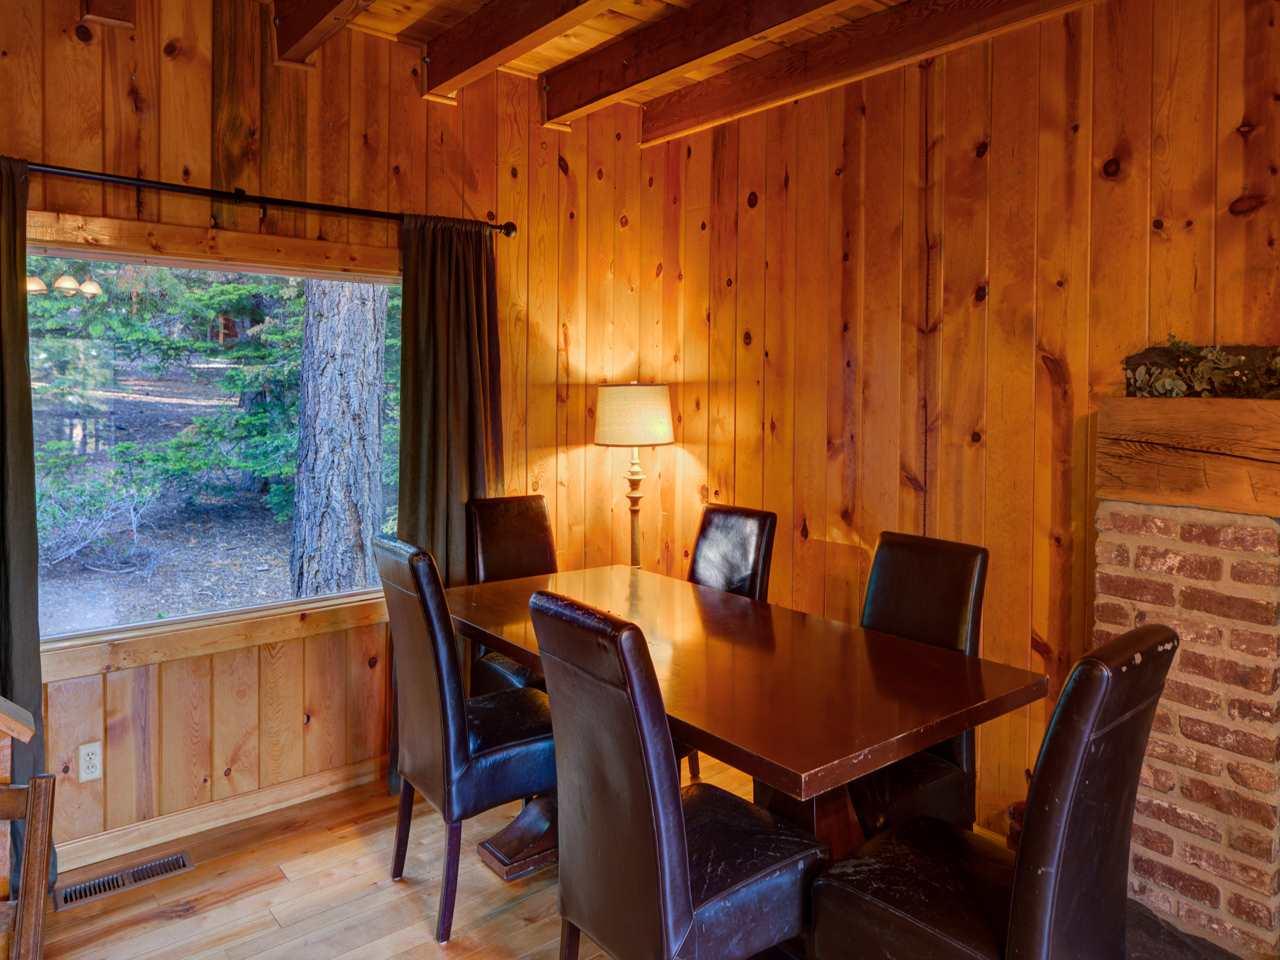 Additional photo for property listing at 690 Shamrock Road 690 Shamrock Road Tahoe City, California 96140 United States